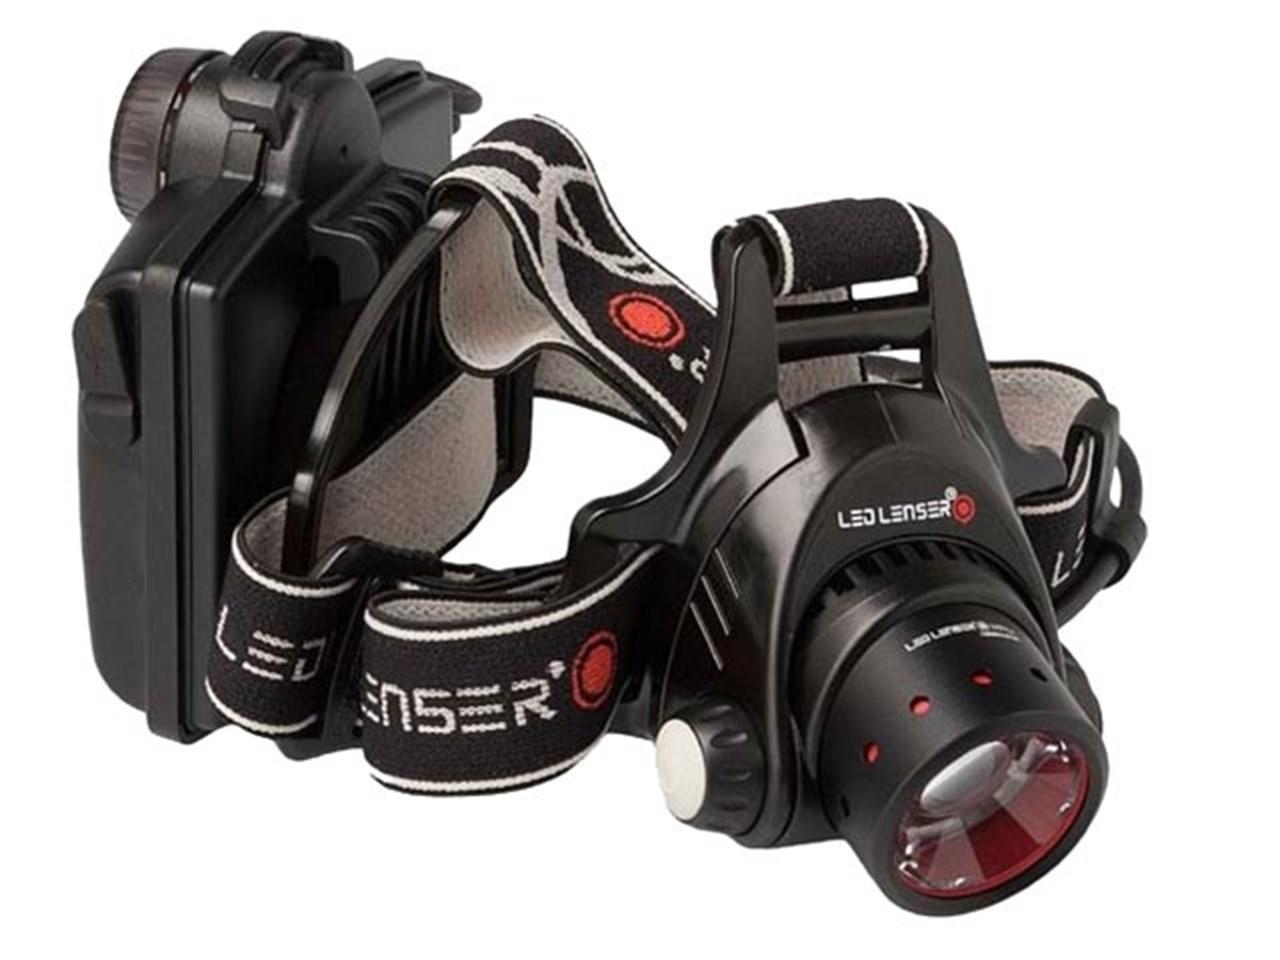 led lenser h14r 2 rechargeable head torch. Black Bedroom Furniture Sets. Home Design Ideas